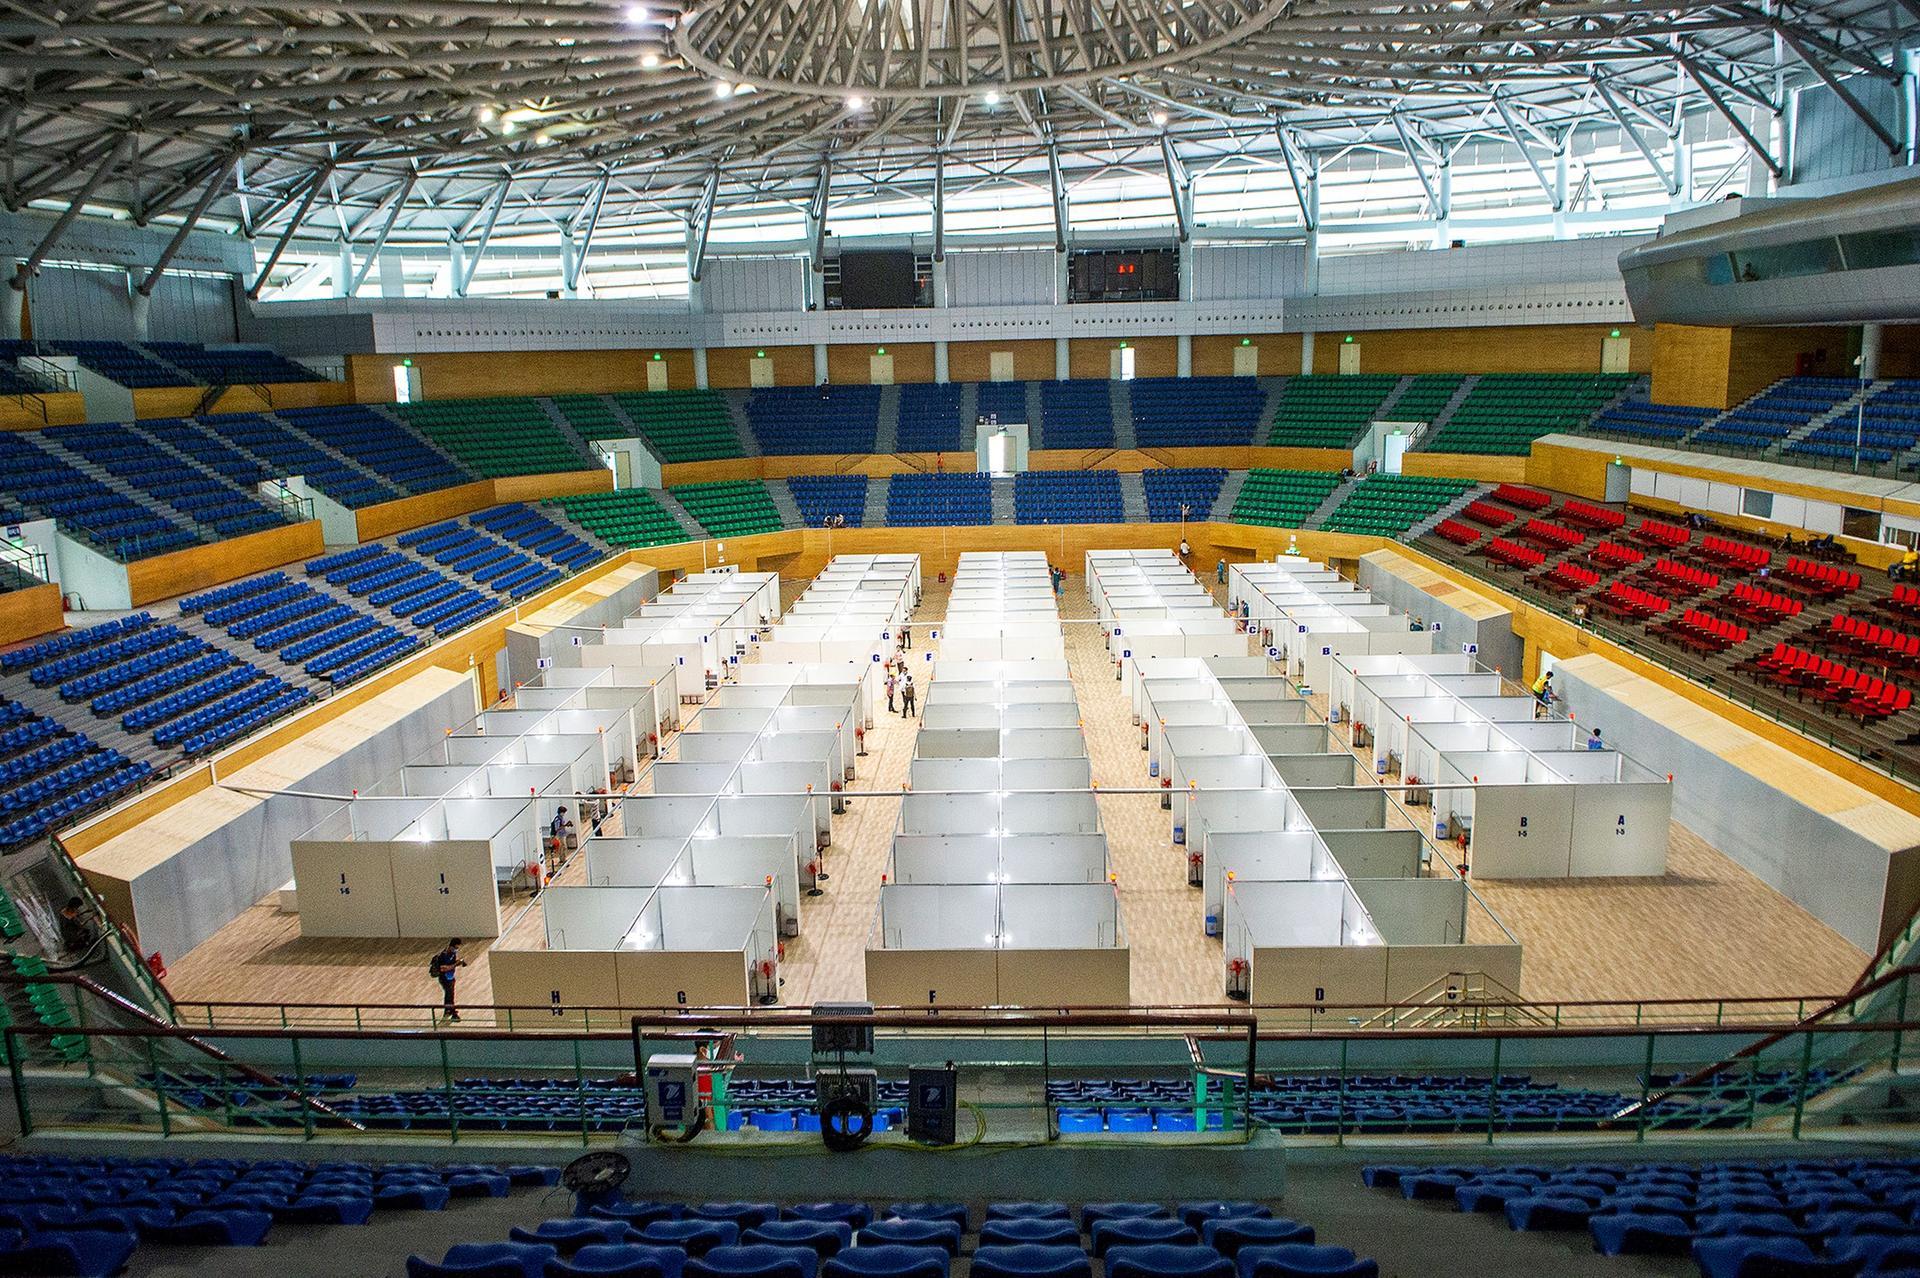 Vietnam turns Da Nang stadium into field hospital amid virus outbreak